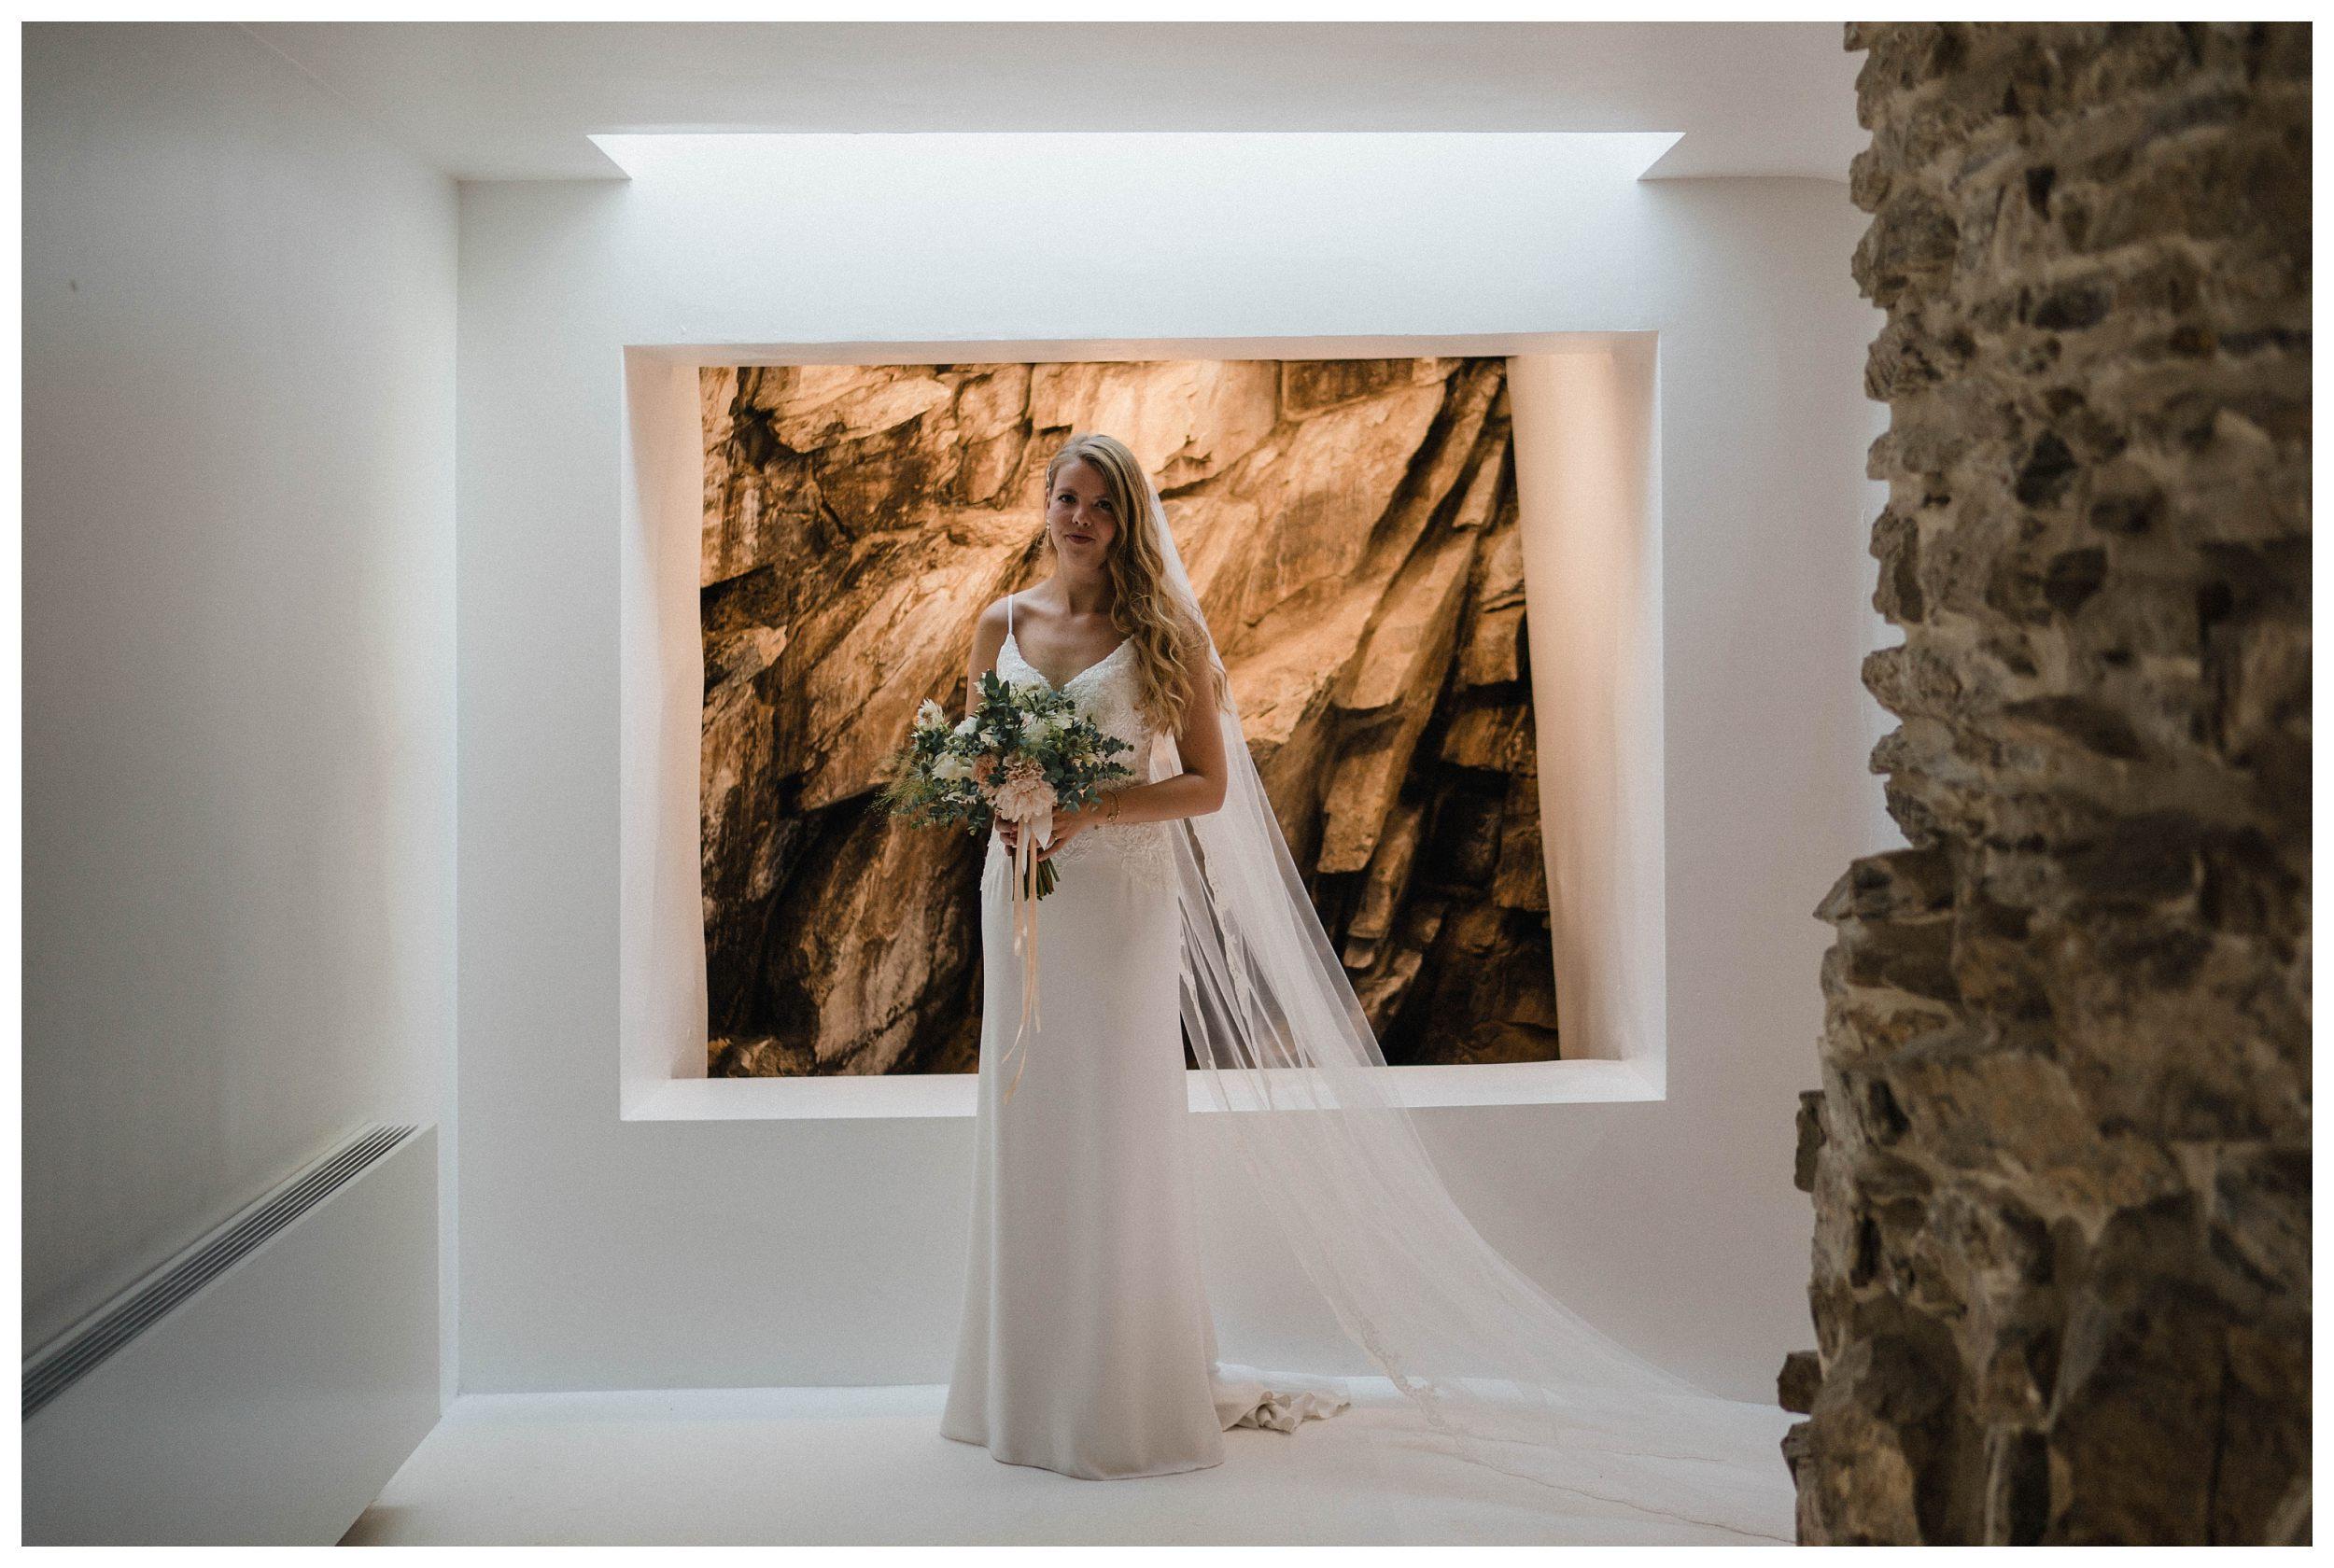 huwelijksfotograaf bruidsfotograaf destinationwedding huwelijksfotografie in ardennen nederland (28).jpg